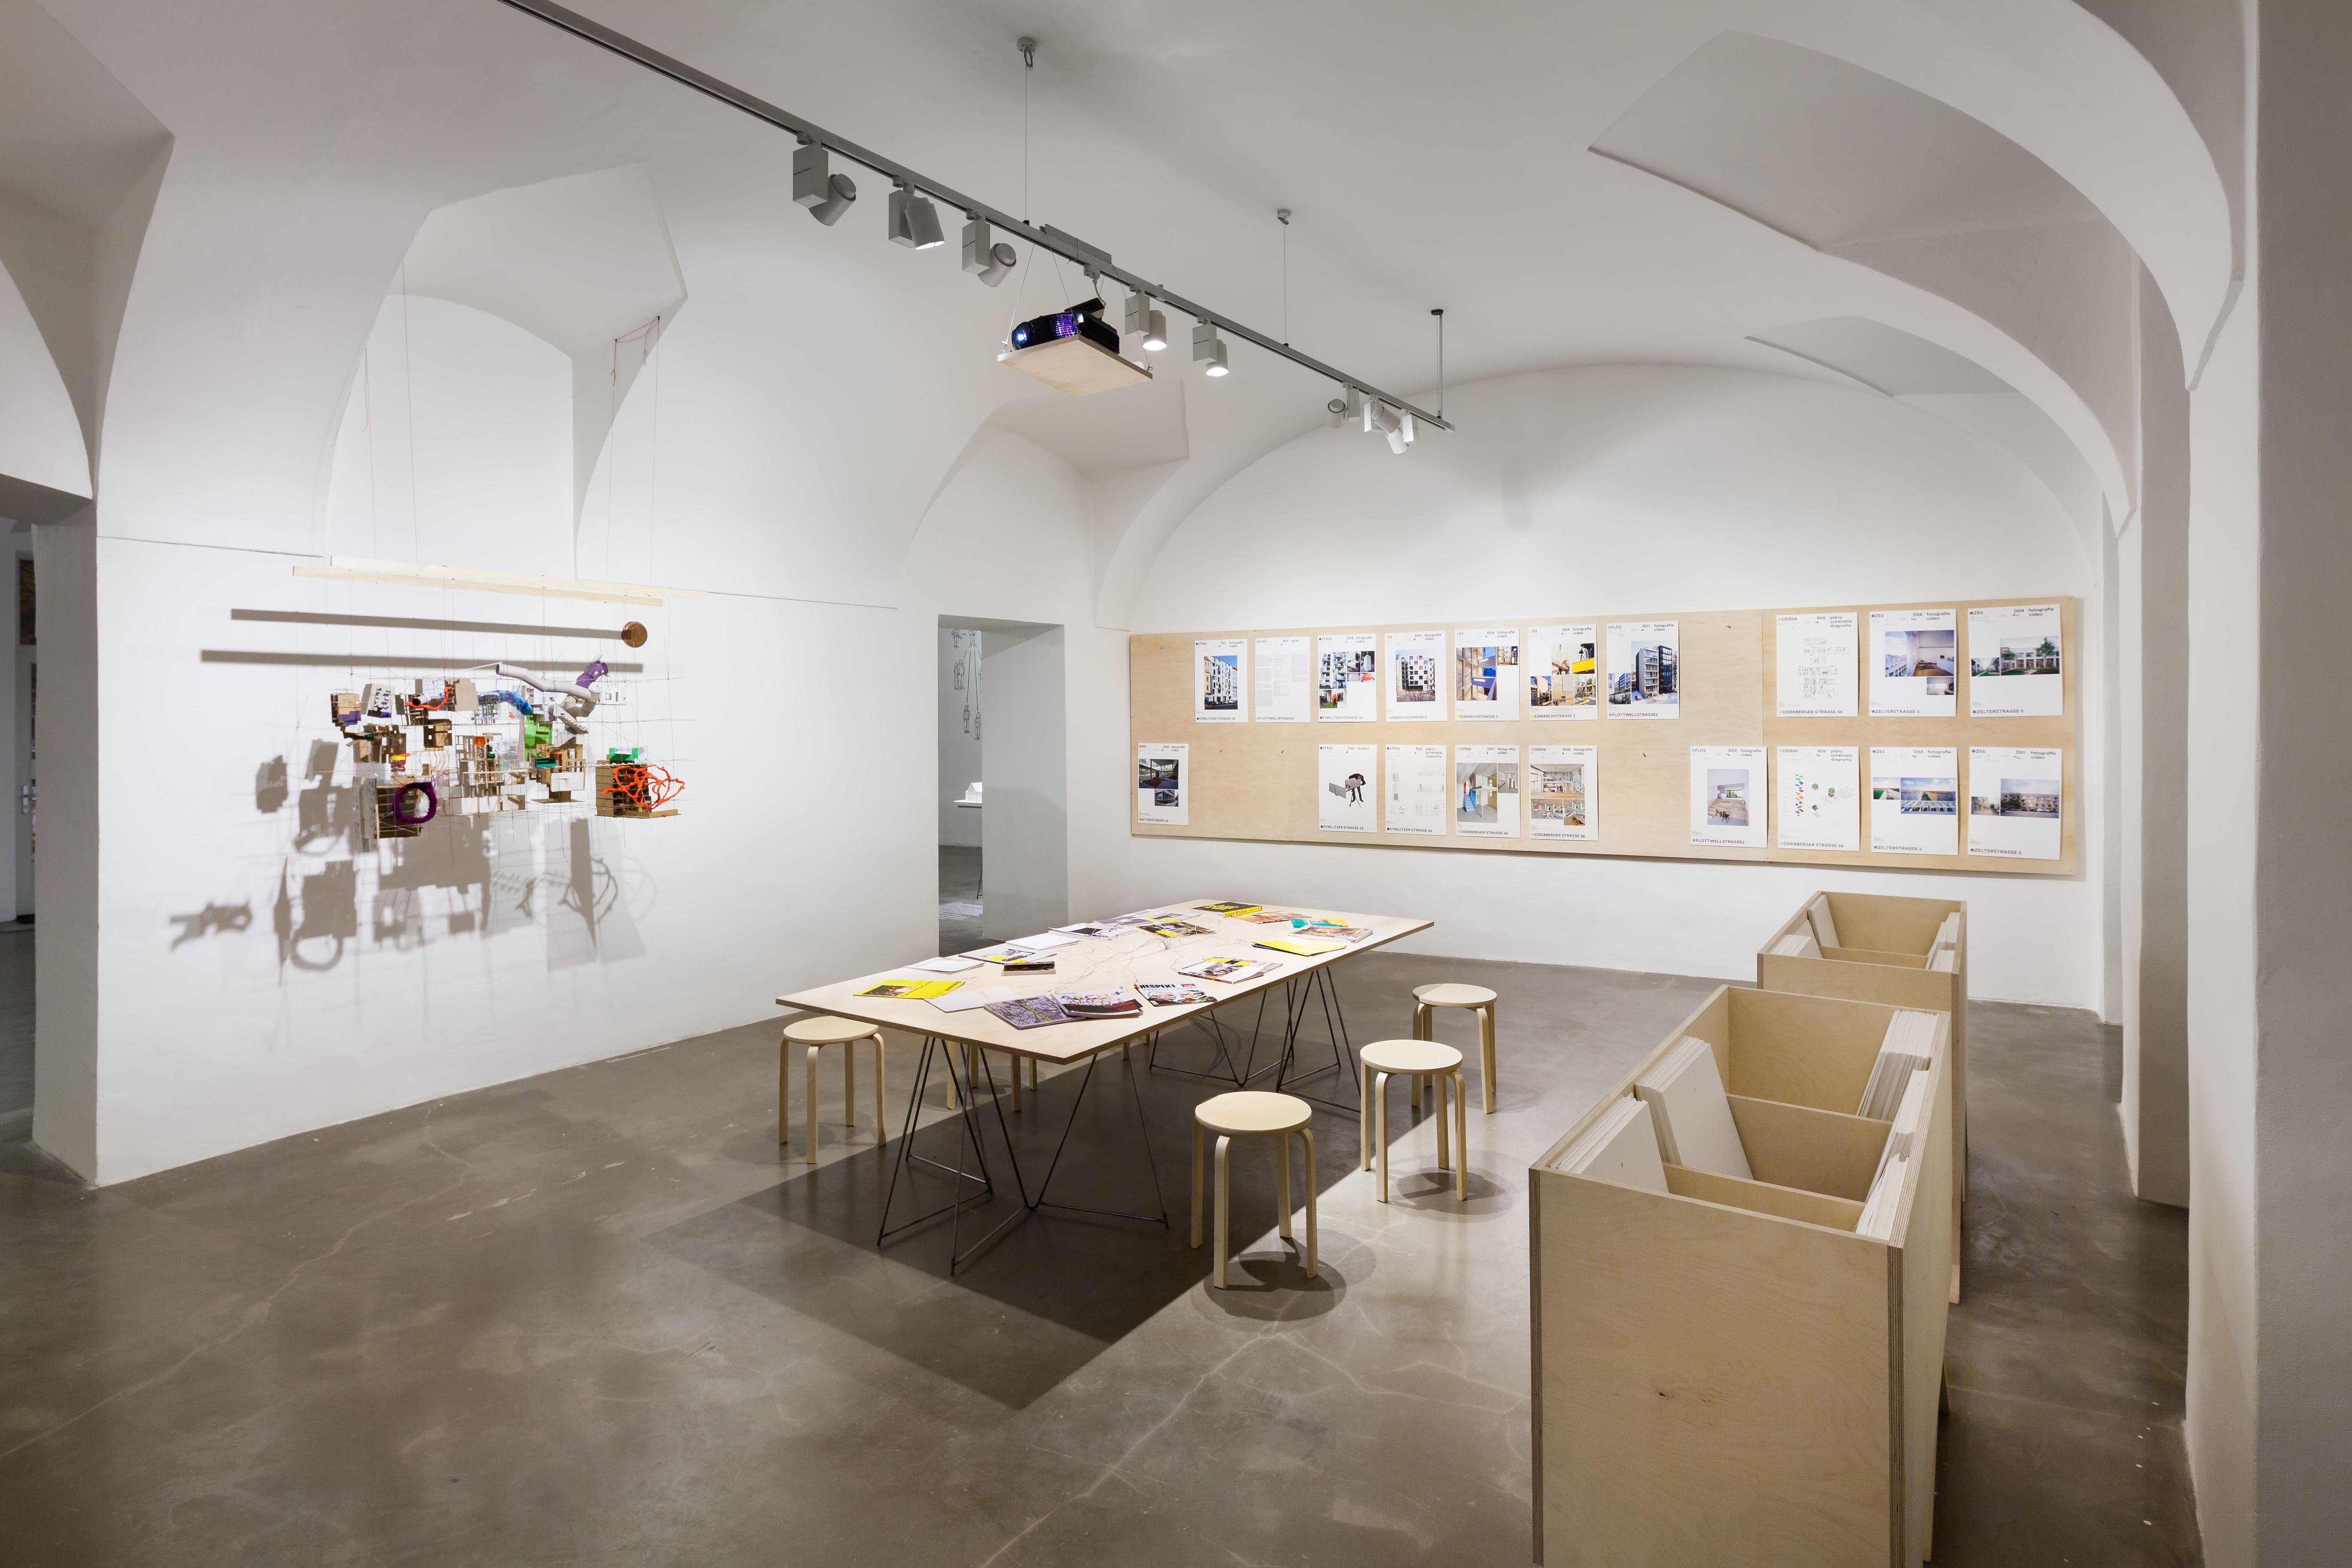 Baugruppe ist super! Contemporary Housing – inspiration from Berlin ...